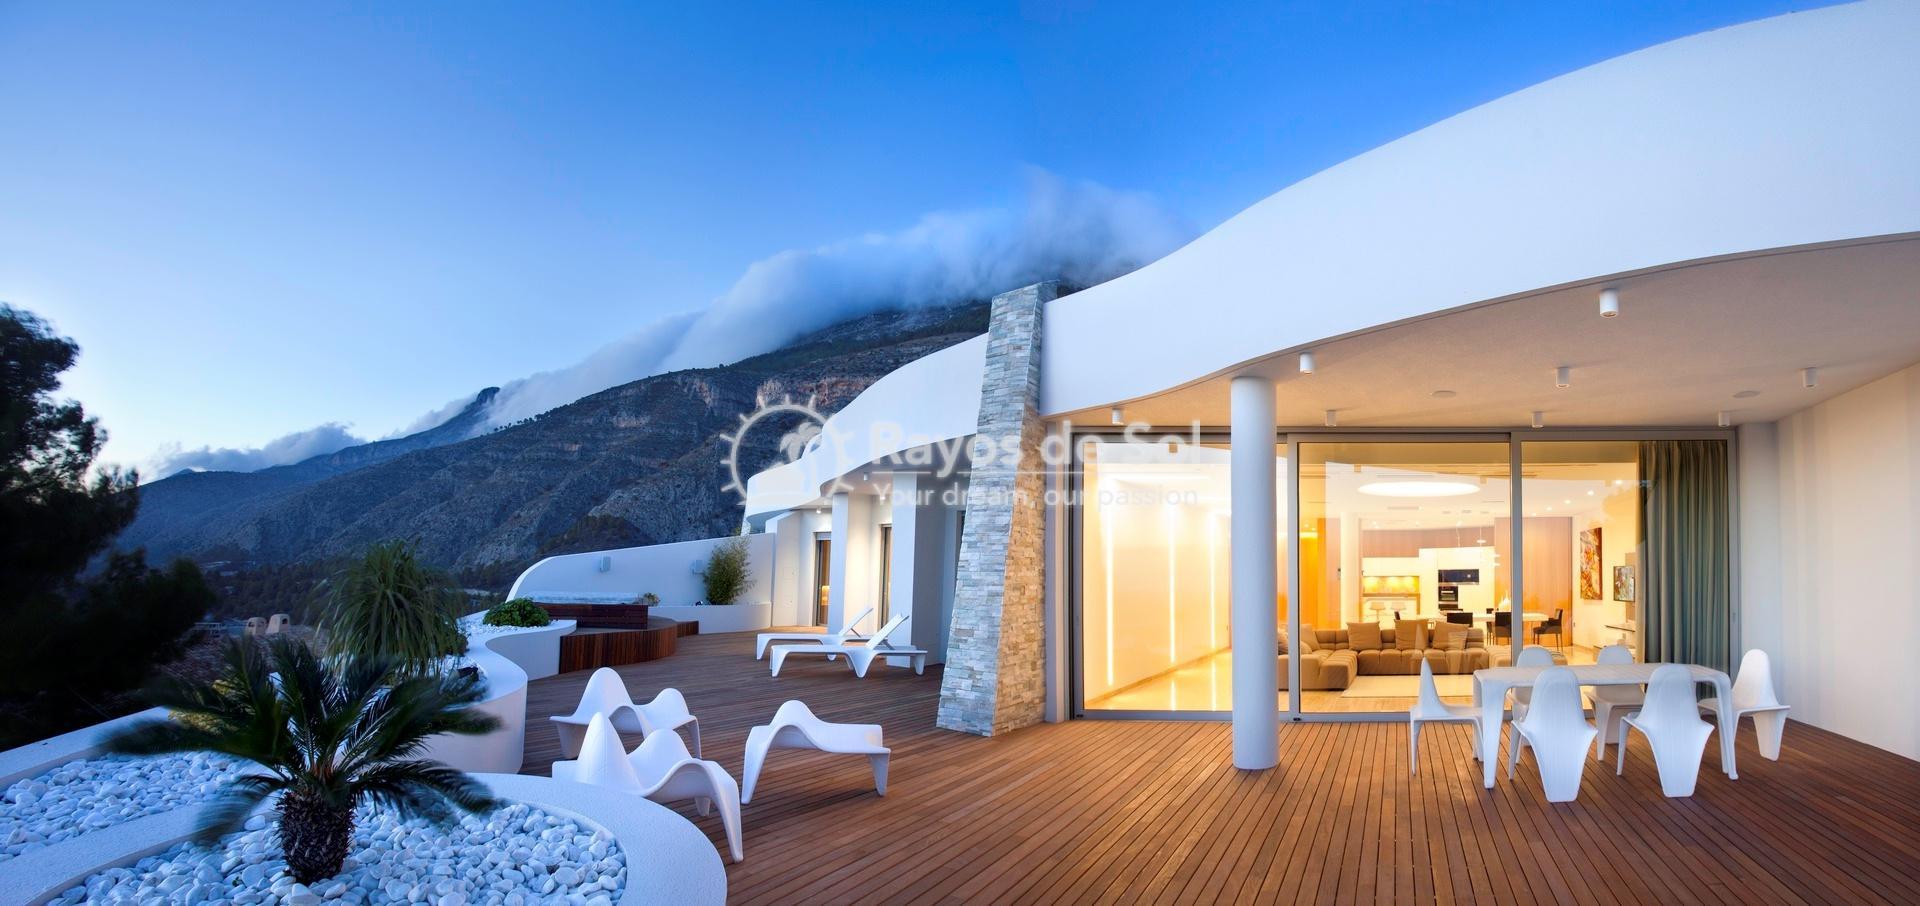 Very exclusive apartment  in Altea Hills, Altea, Costa Blanca (AHVAOS) - 1